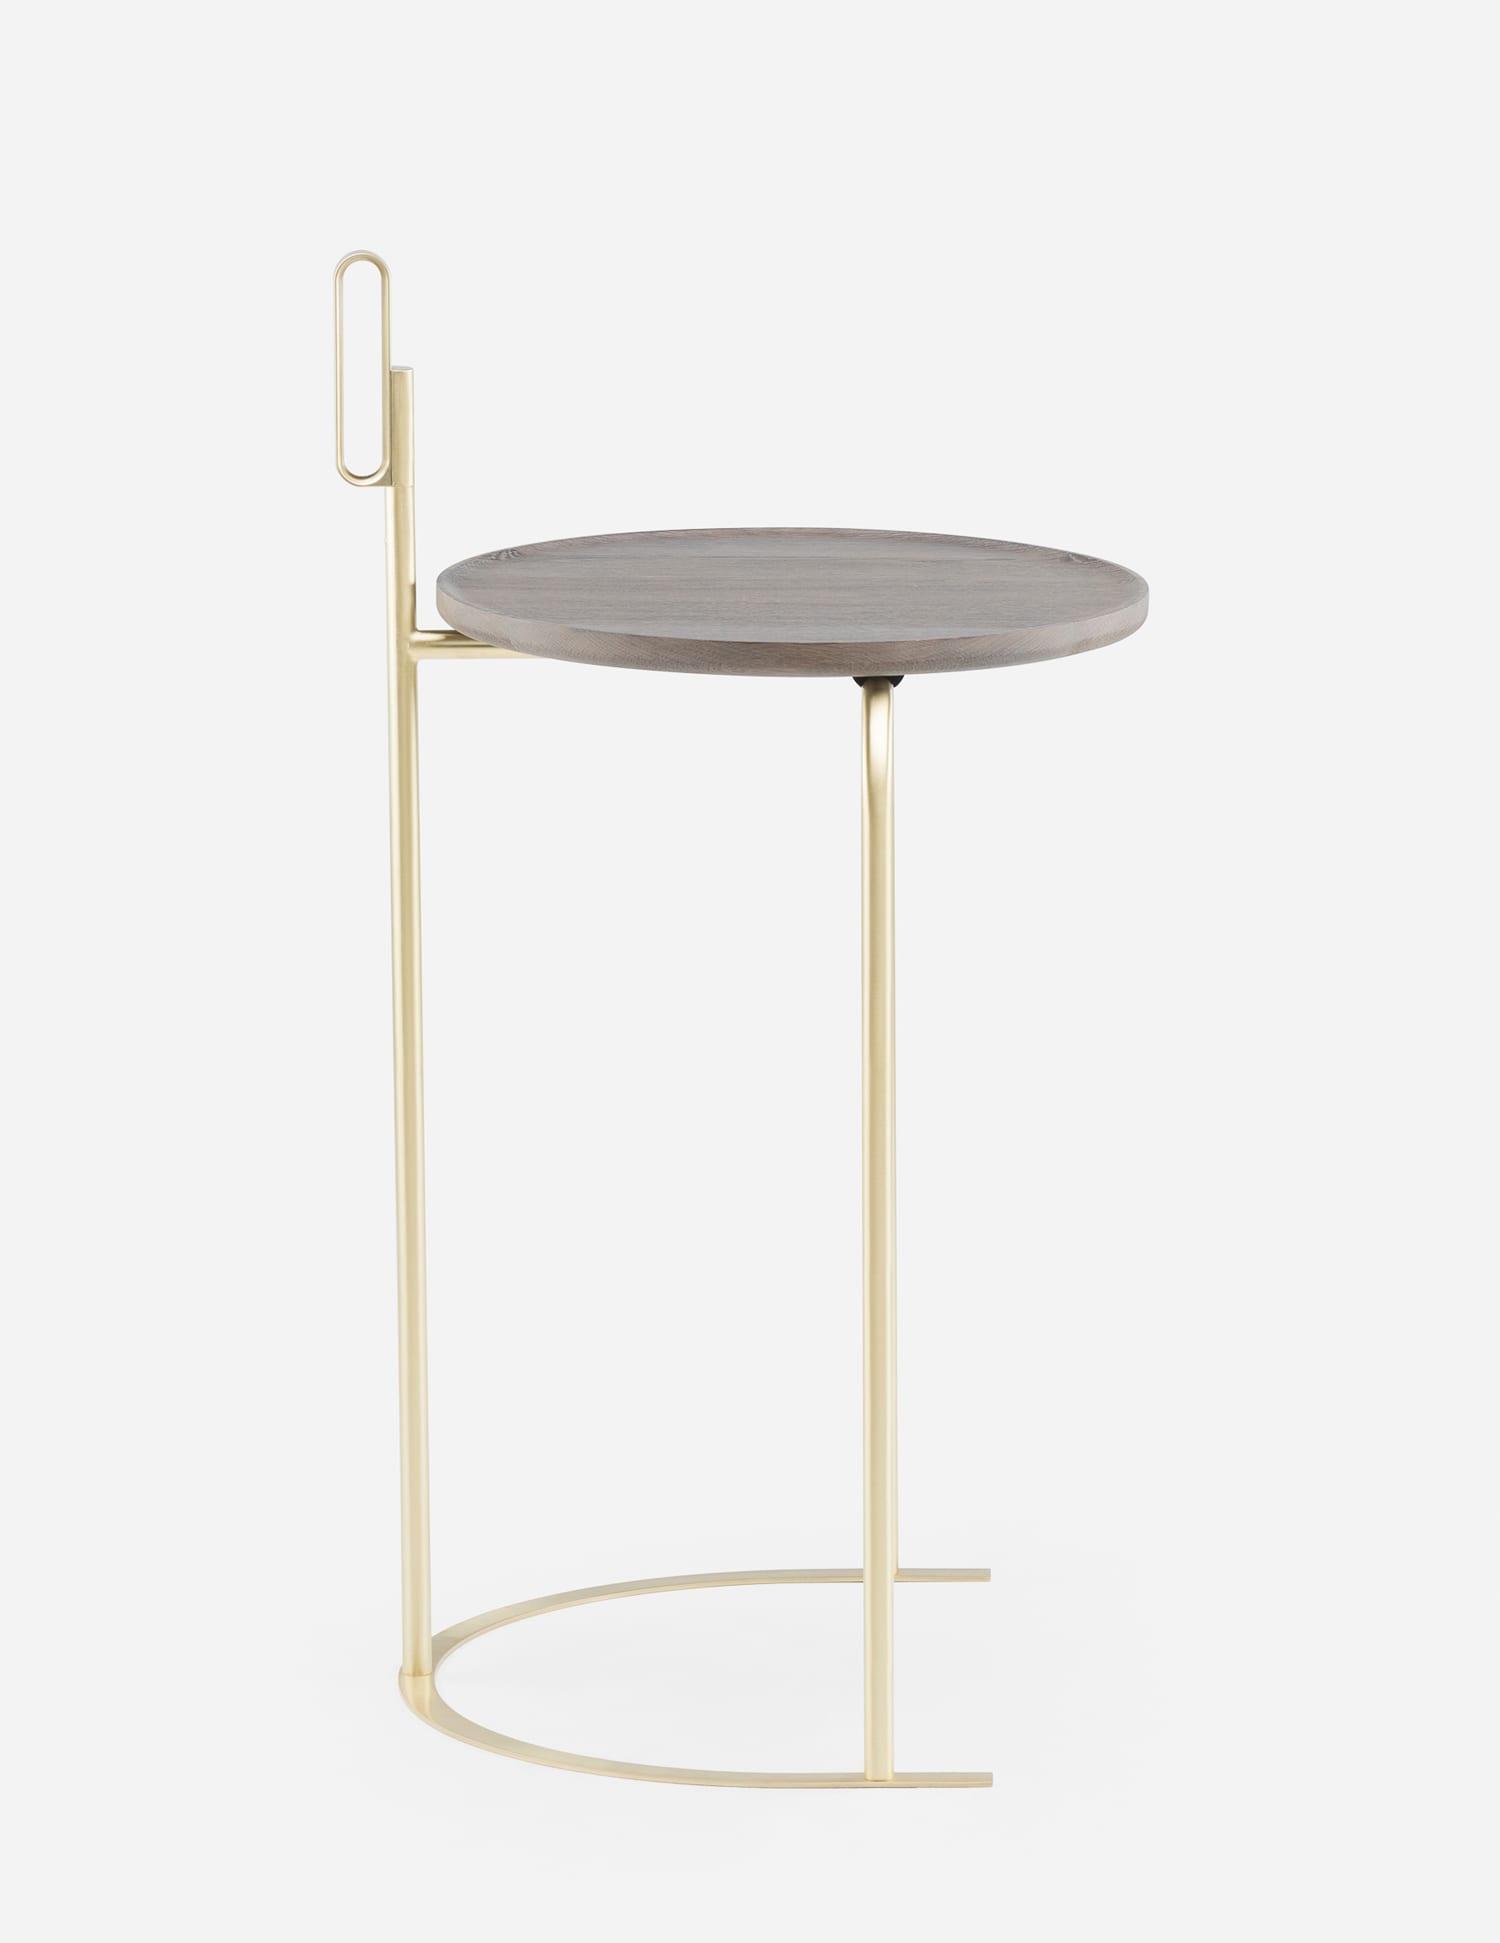 De La Espade Handle Side Table by Neri&Hu at Stockholm Furniture Fair 2018   Yellowtrace